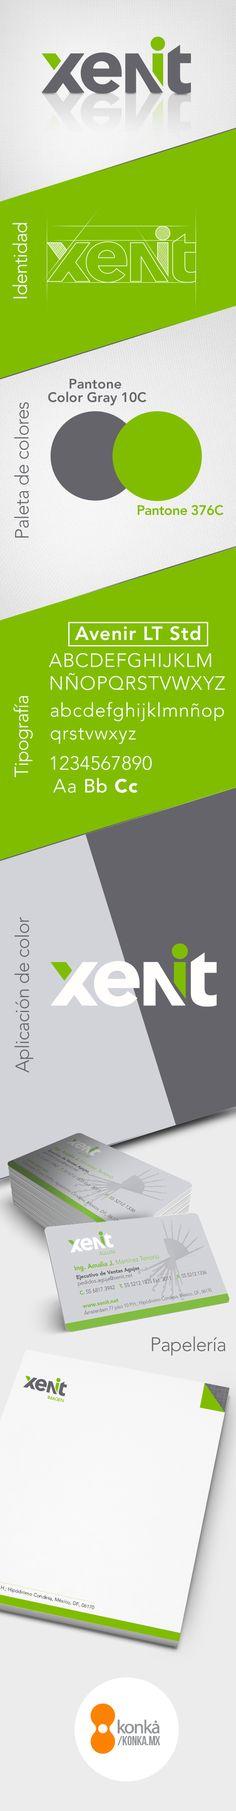 Identidad Corporativa - Xenit